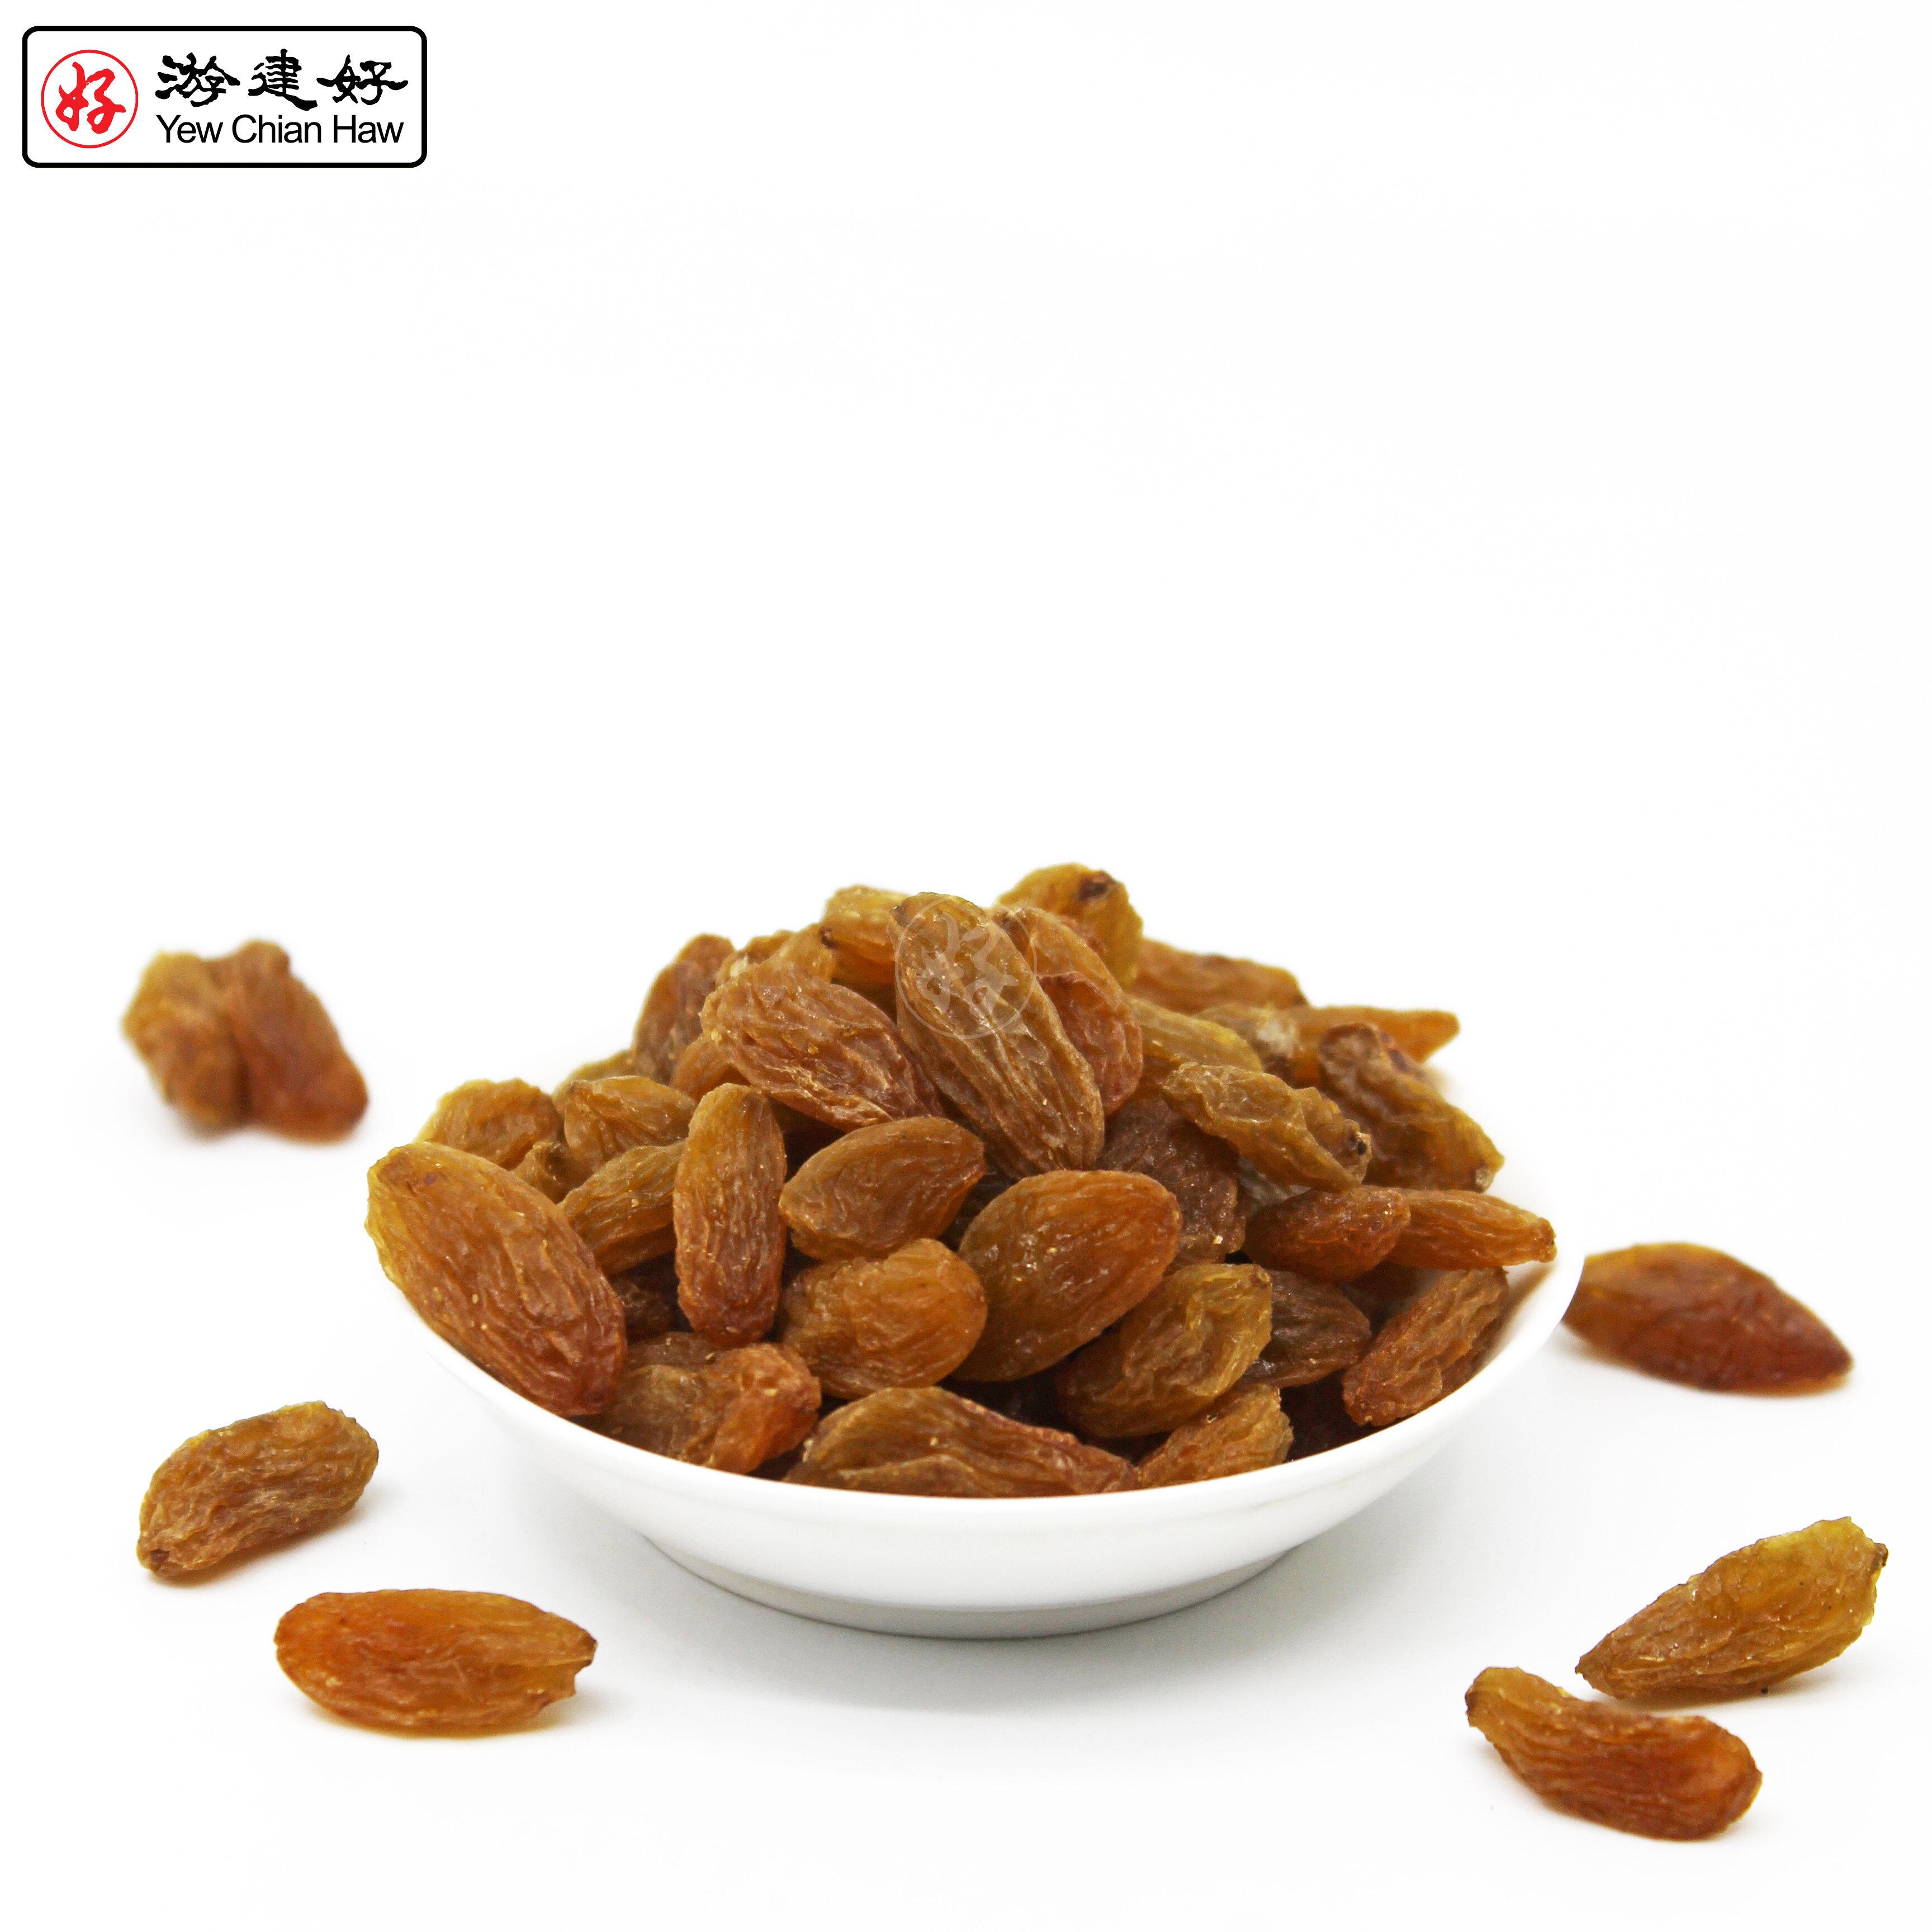 YCH CNY Prosperity 綠葡萄乾 Green Grape Seedless Raisin (160gm) 新年礼品 中药礼品 Chinese New Year Herbal Gift